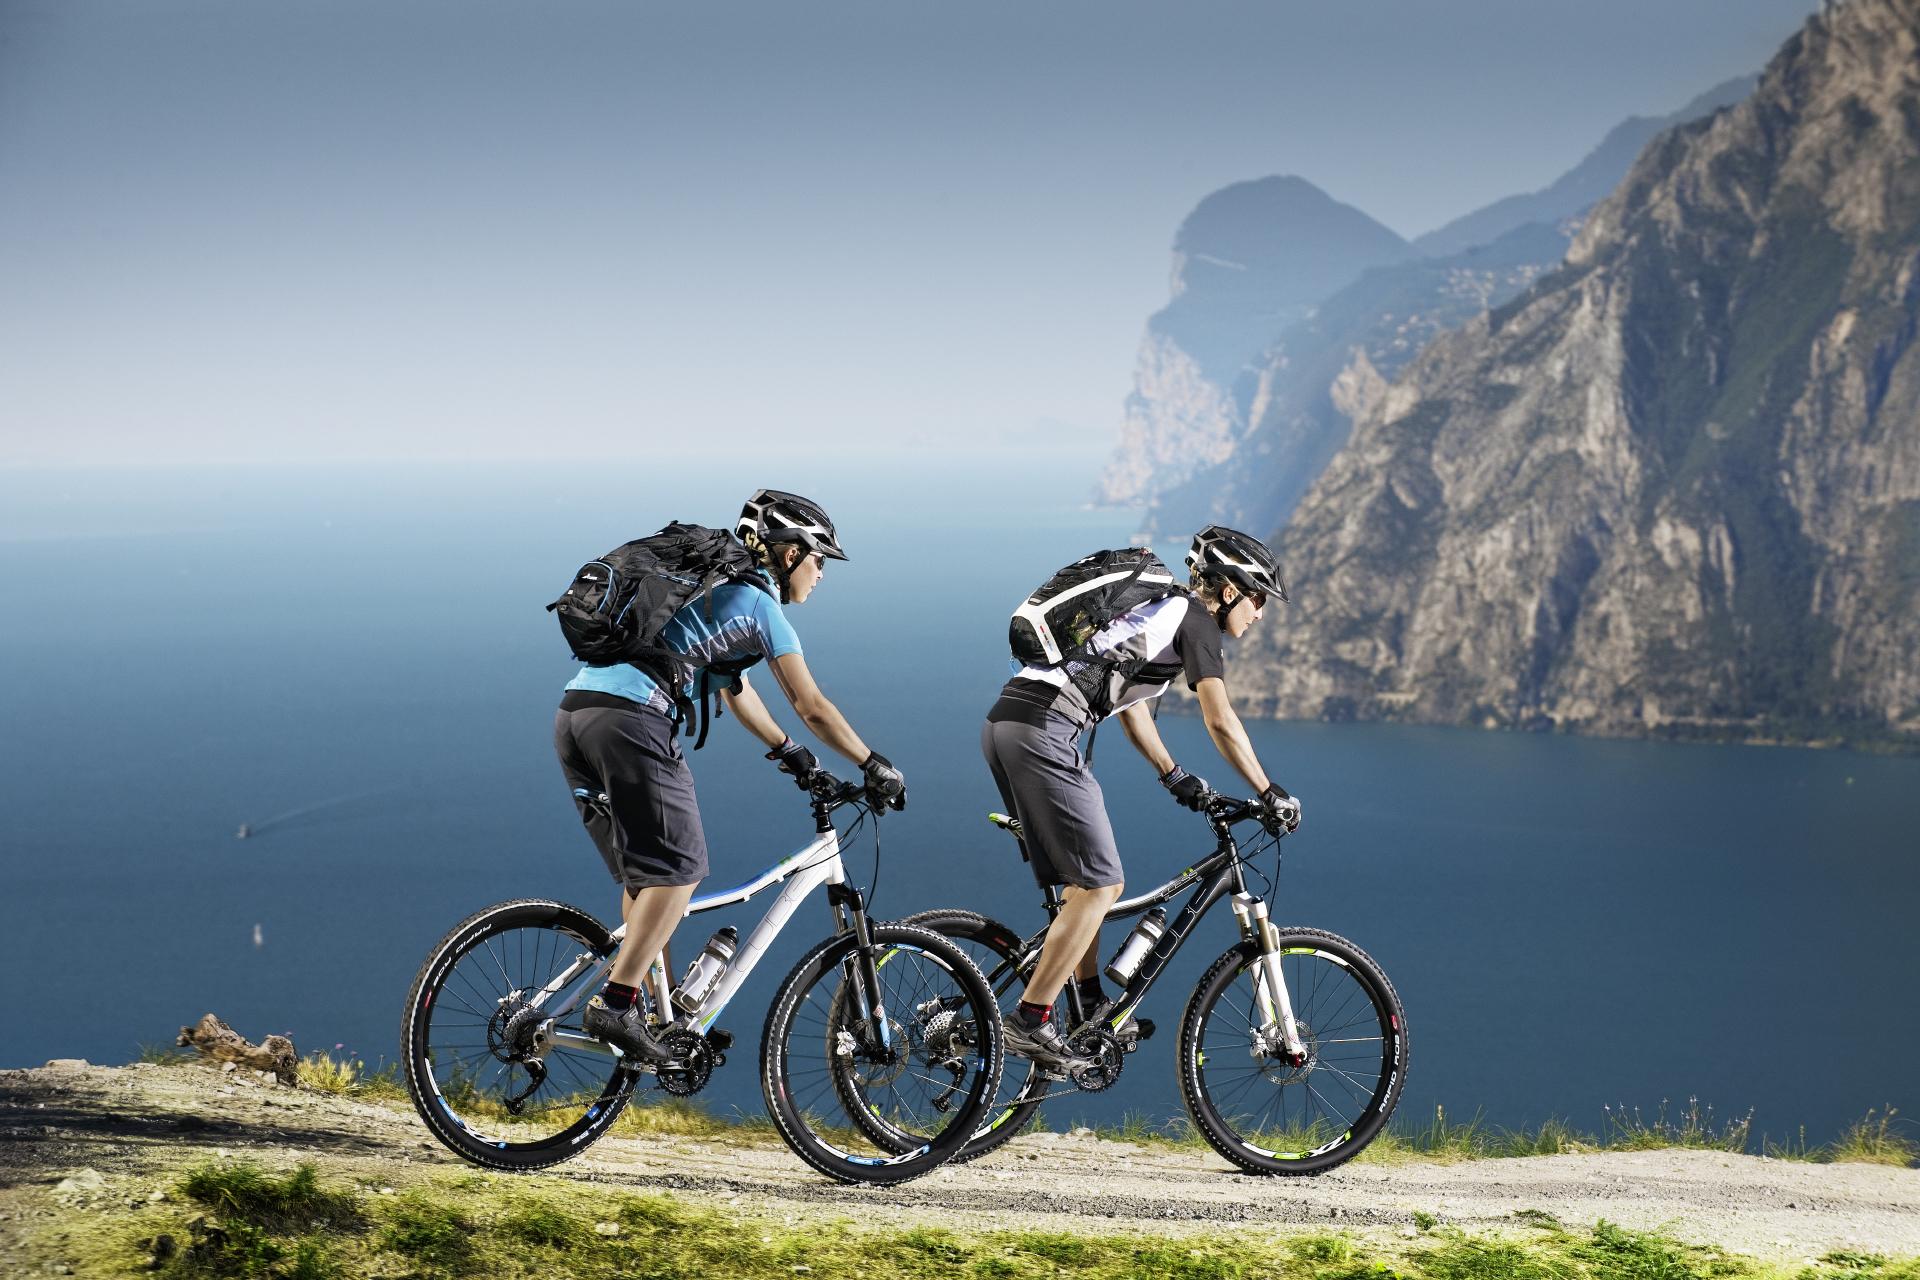 спорт велосипед споротсмен мужчина  № 1633641 загрузить